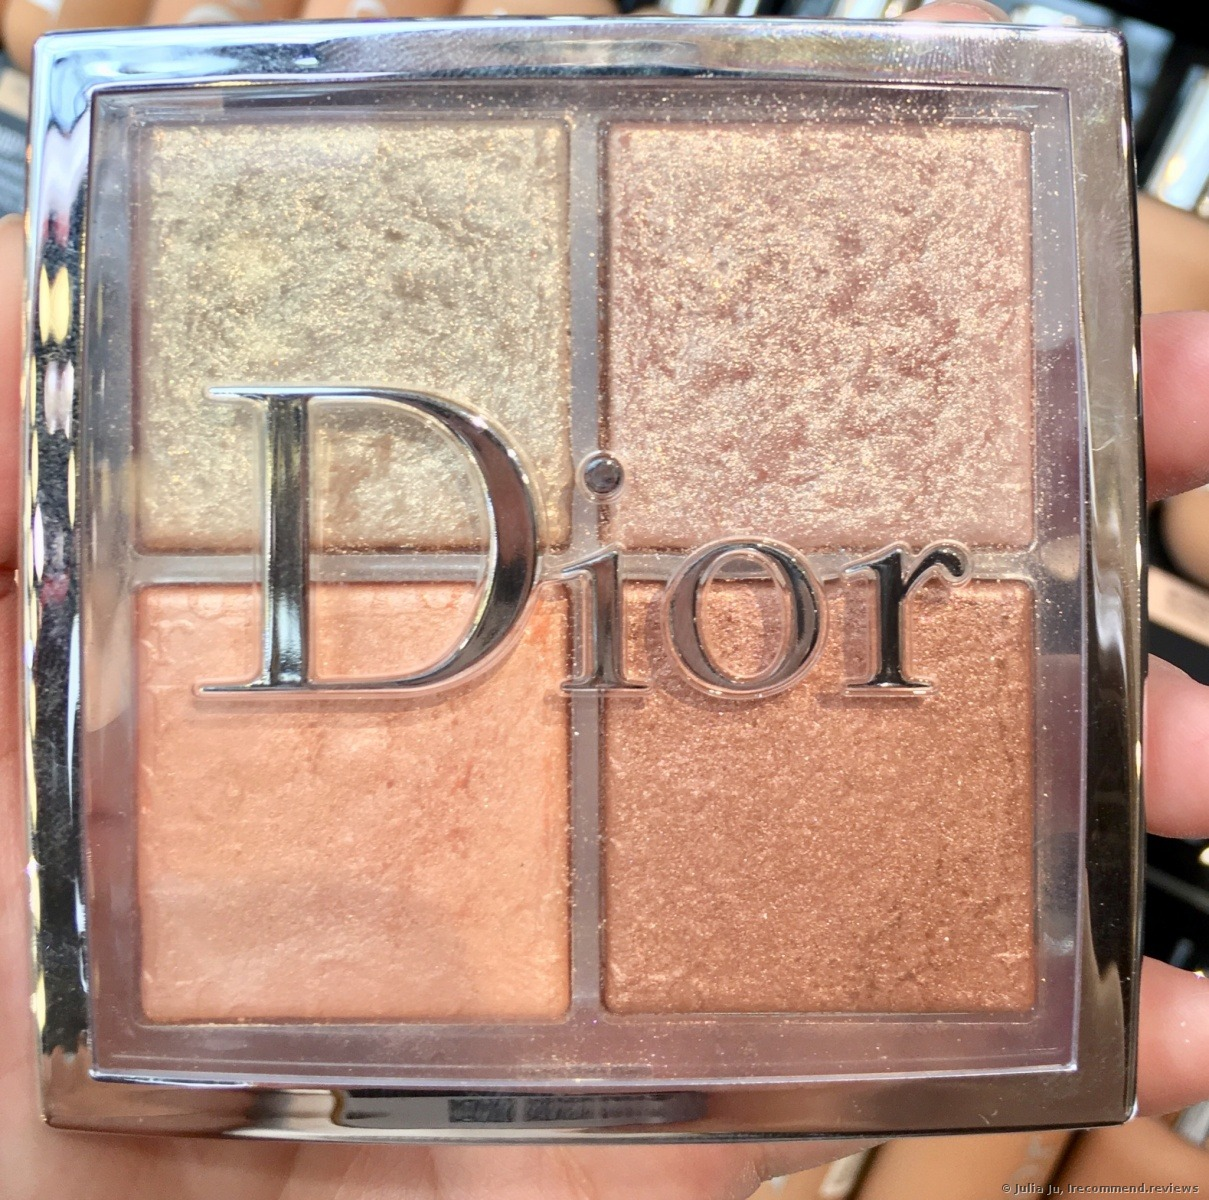 Backstage Glow Face Palette - 002 Glitz by Dior #17